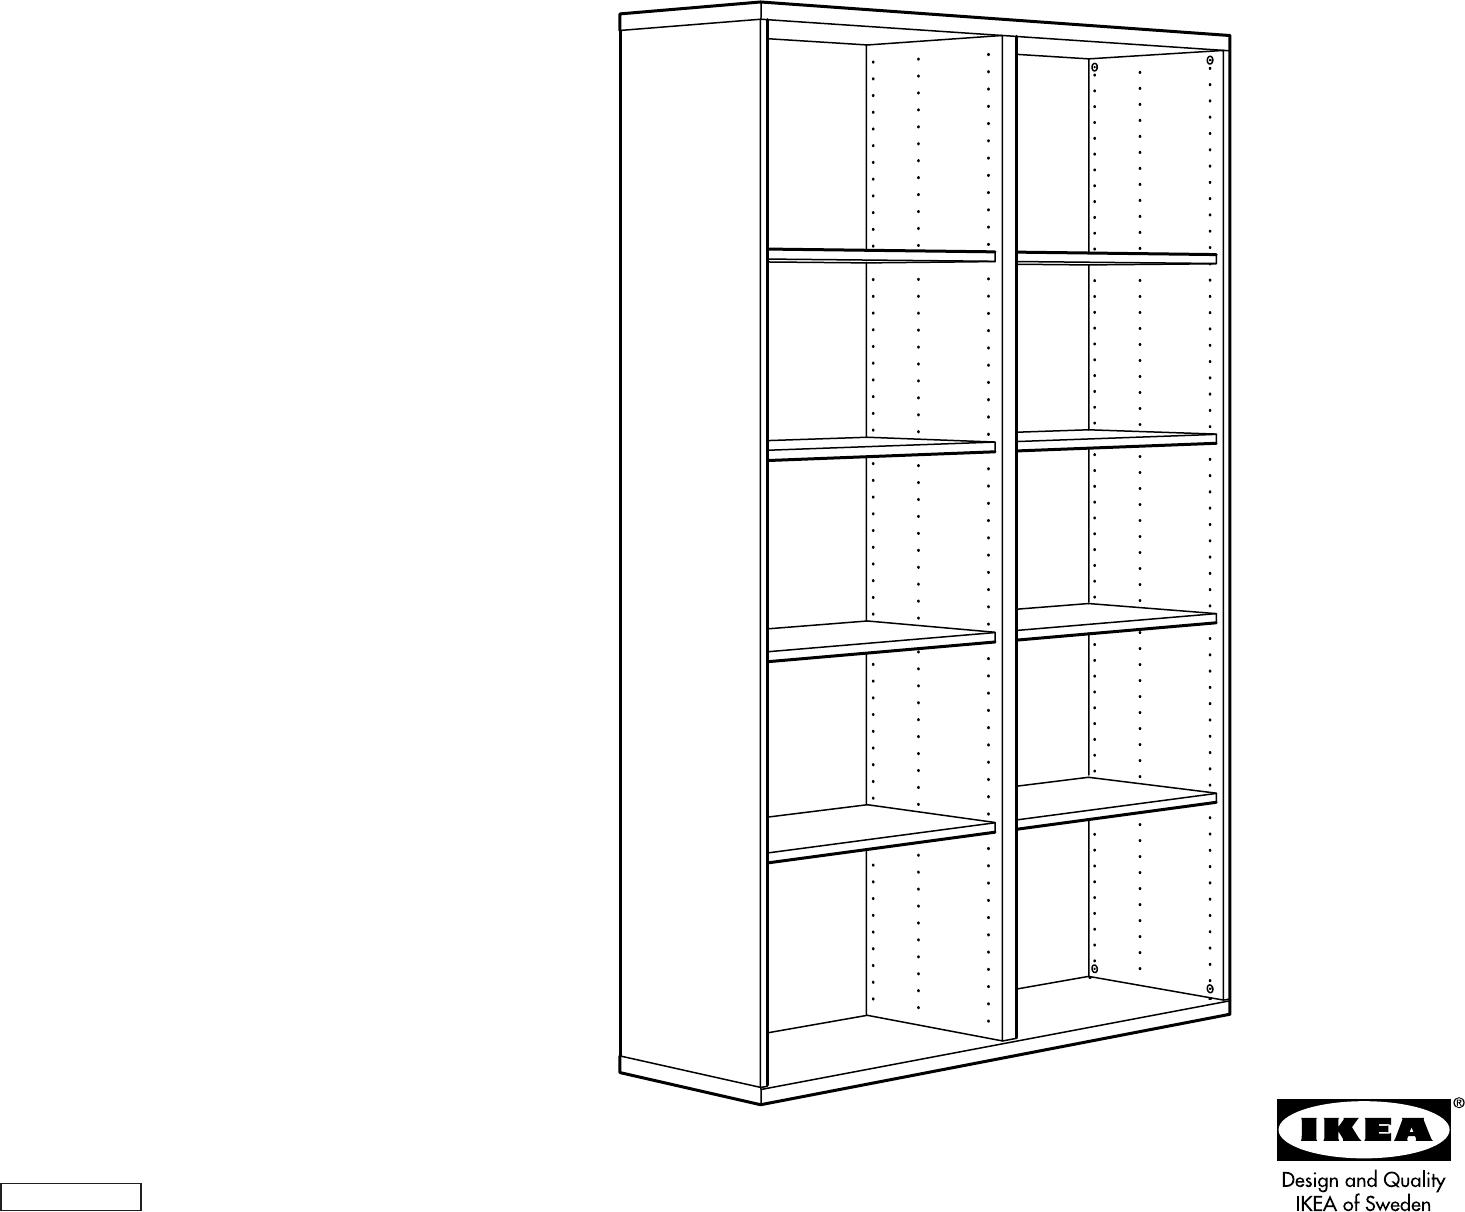 Grundtal Towel Stand From Ikea ~ Handleiding Ikea Besta kast 2 (pagina 1 van 10) (2,27 mb Dansk